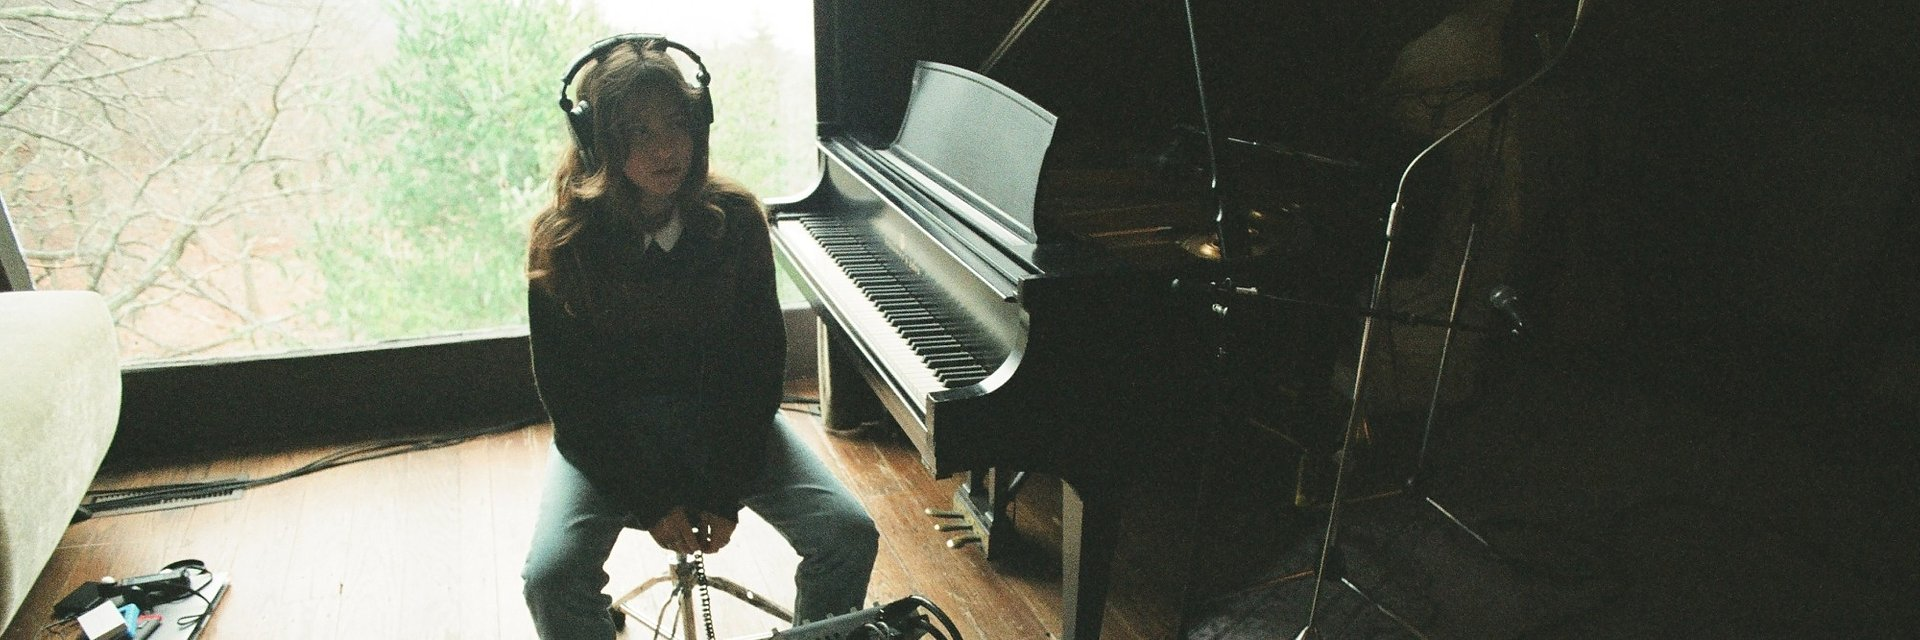 Clairo zapowiada drugi album